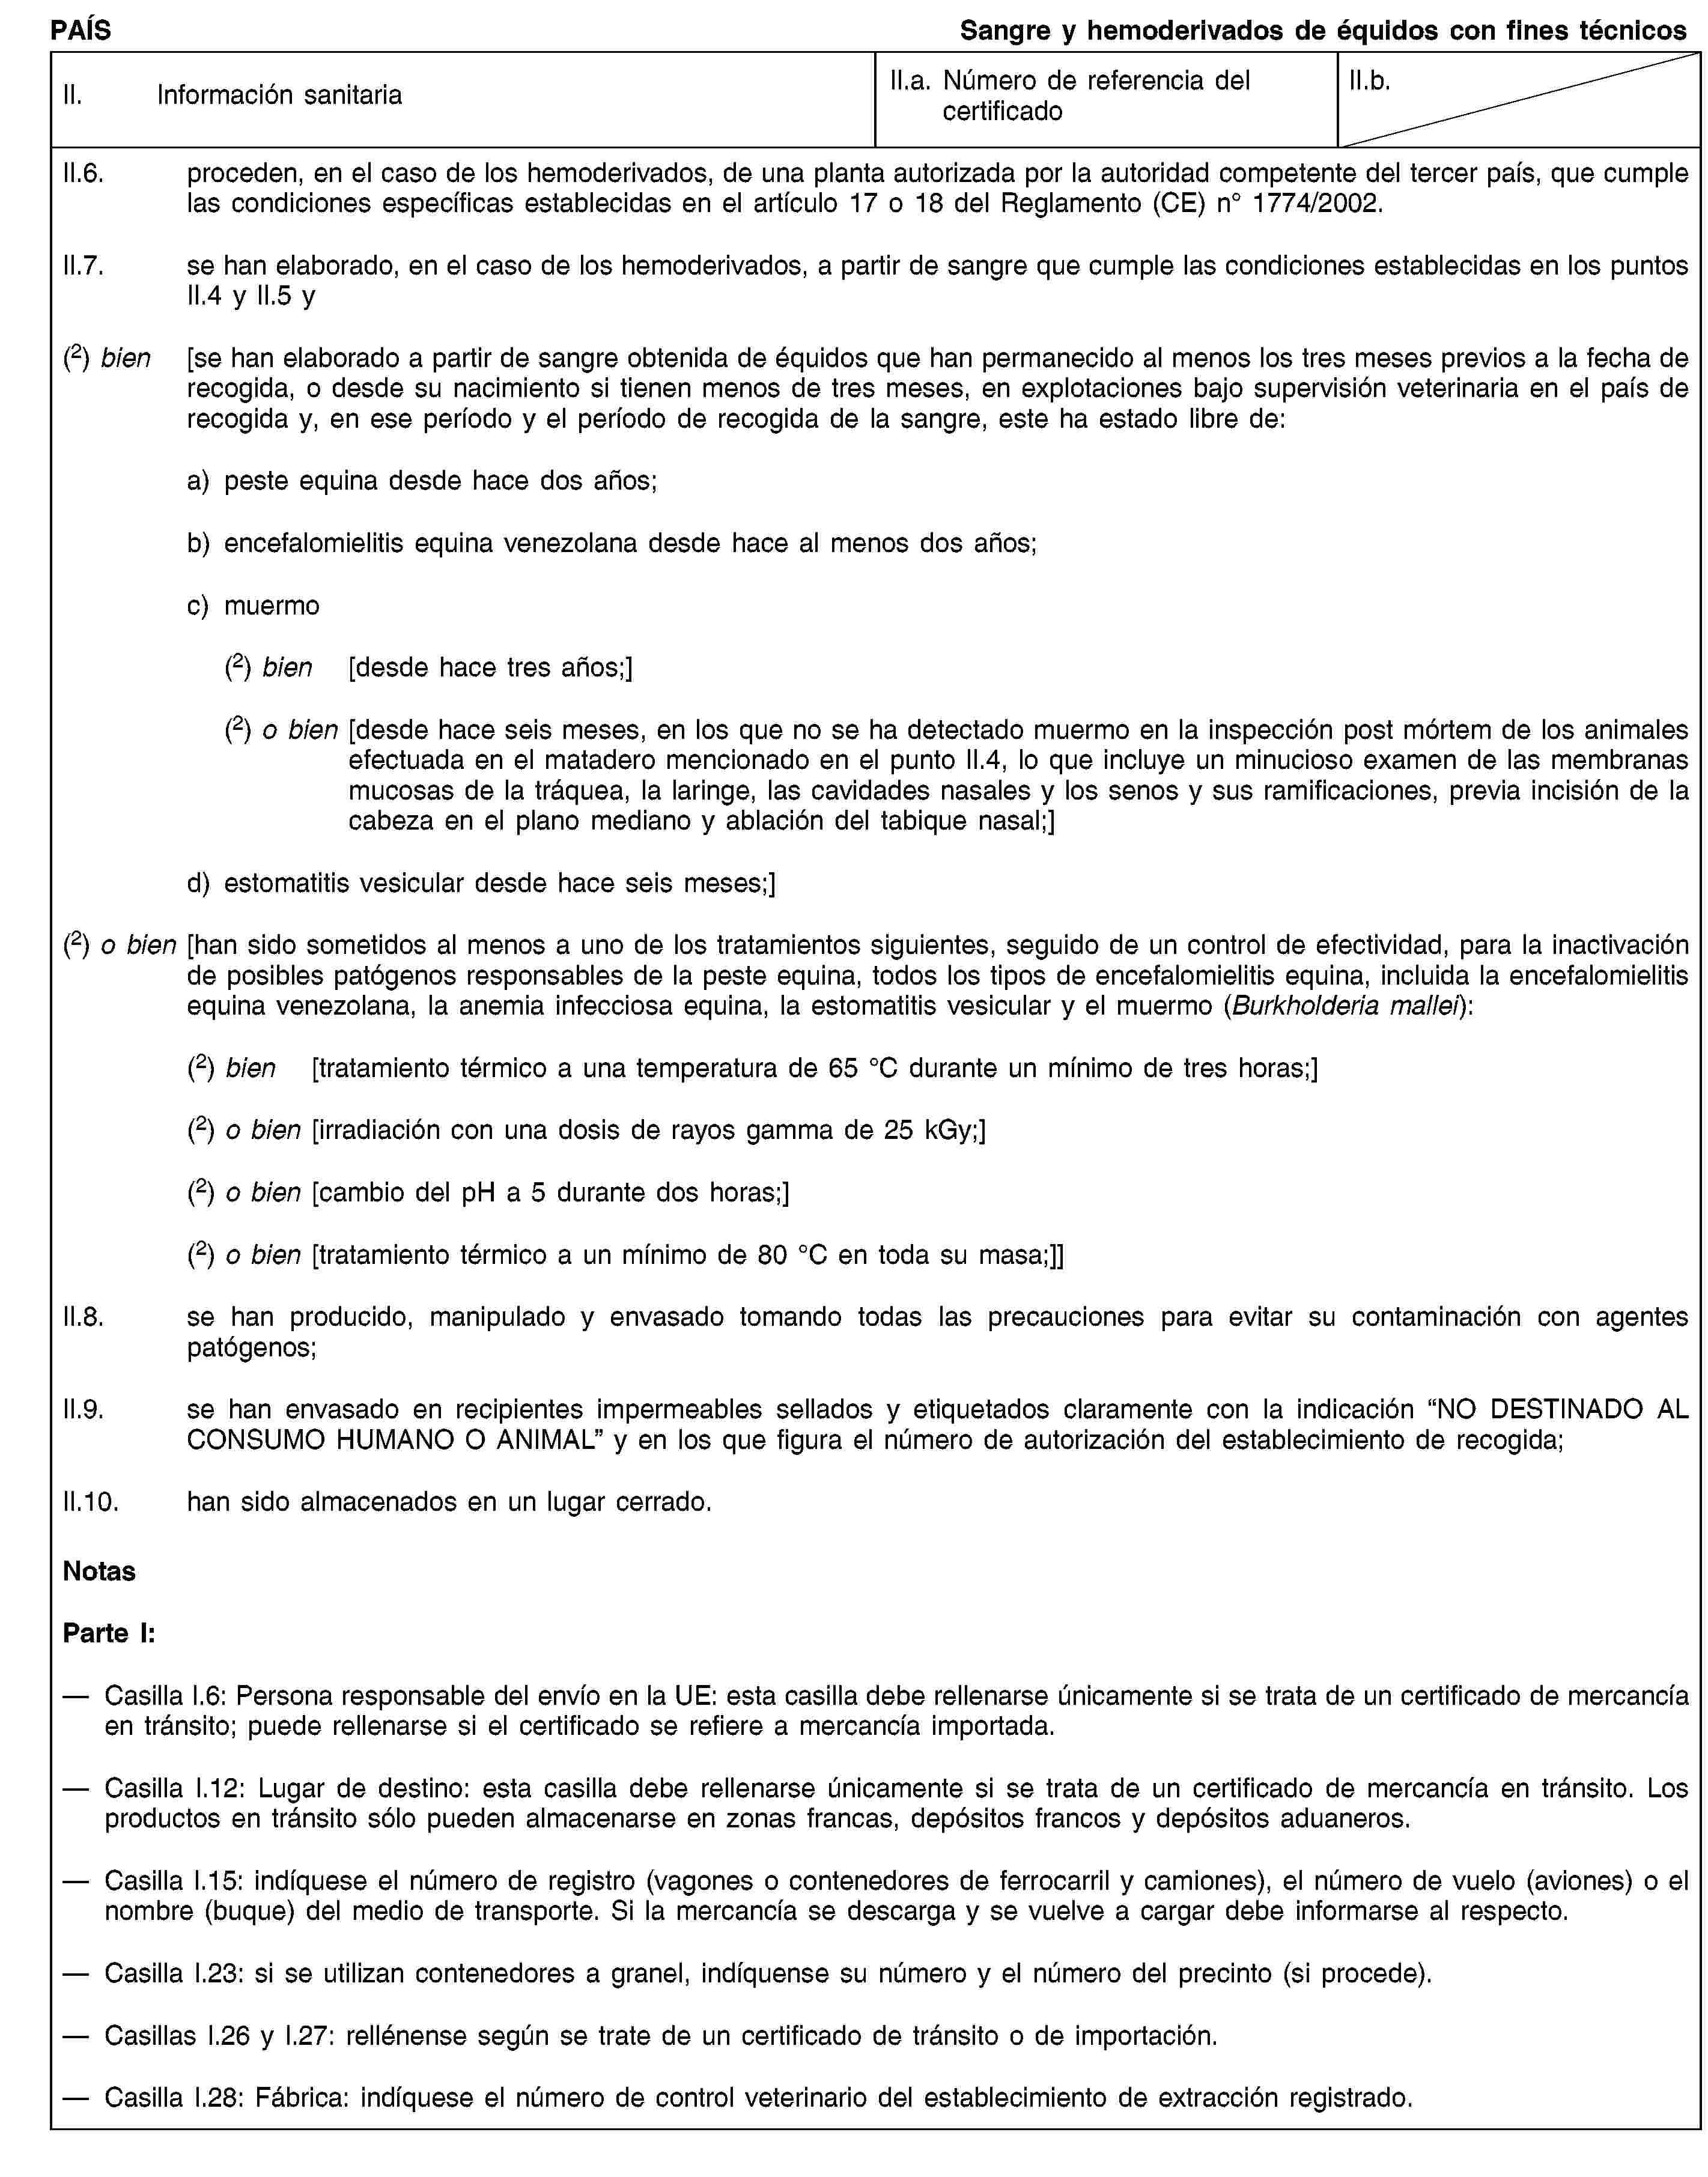 EUR-Lex - 02002R1774-20100928 - EN - EUR-Lex